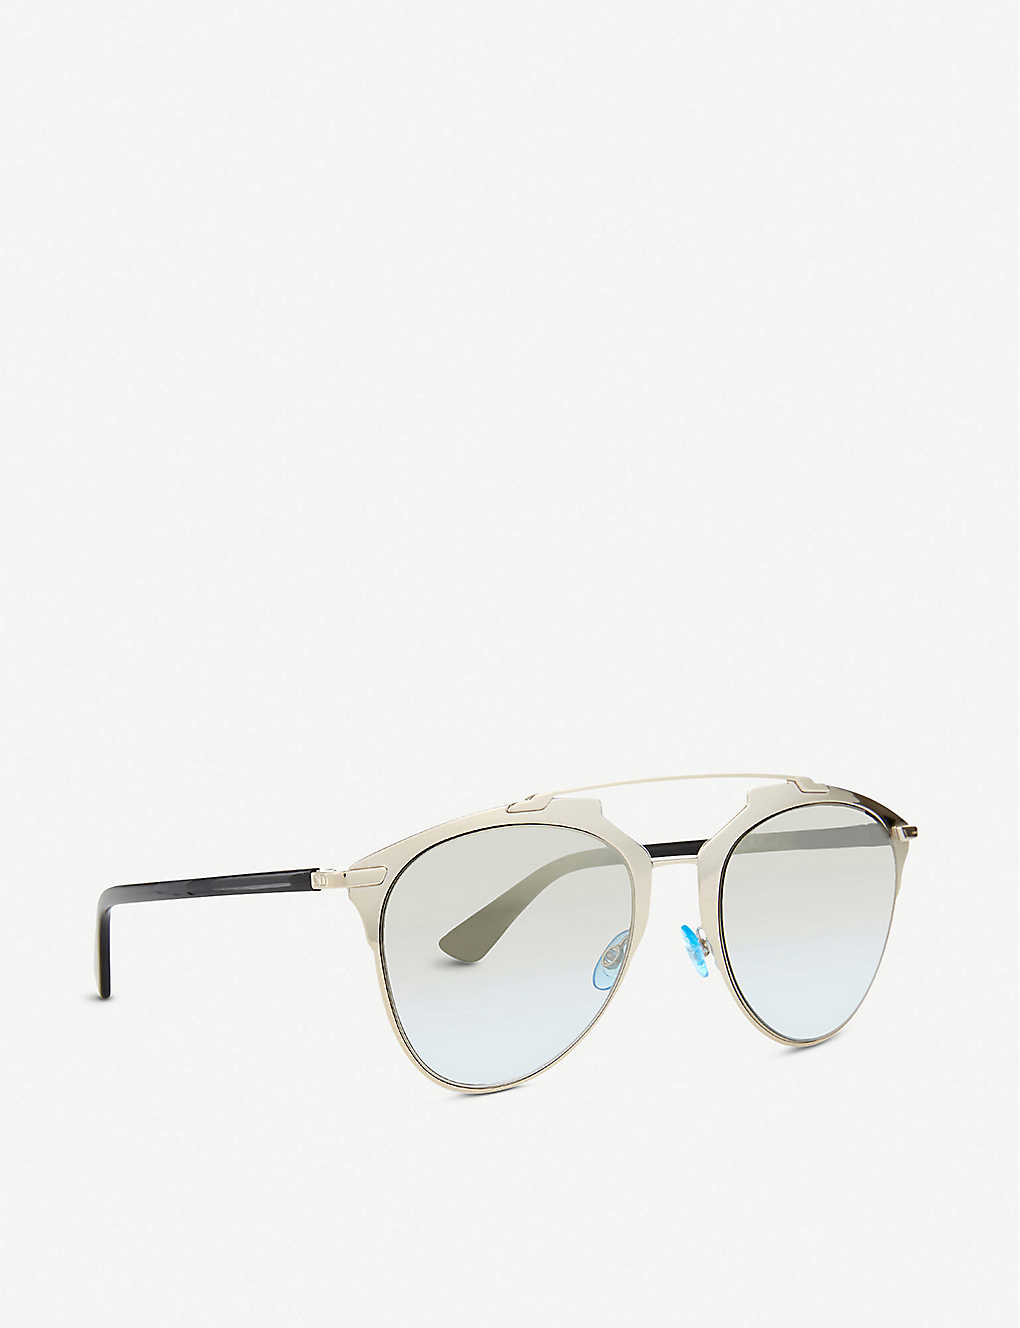 4bf1bc2bd7d1 ... Dior Reflected sunglasses - Black ...